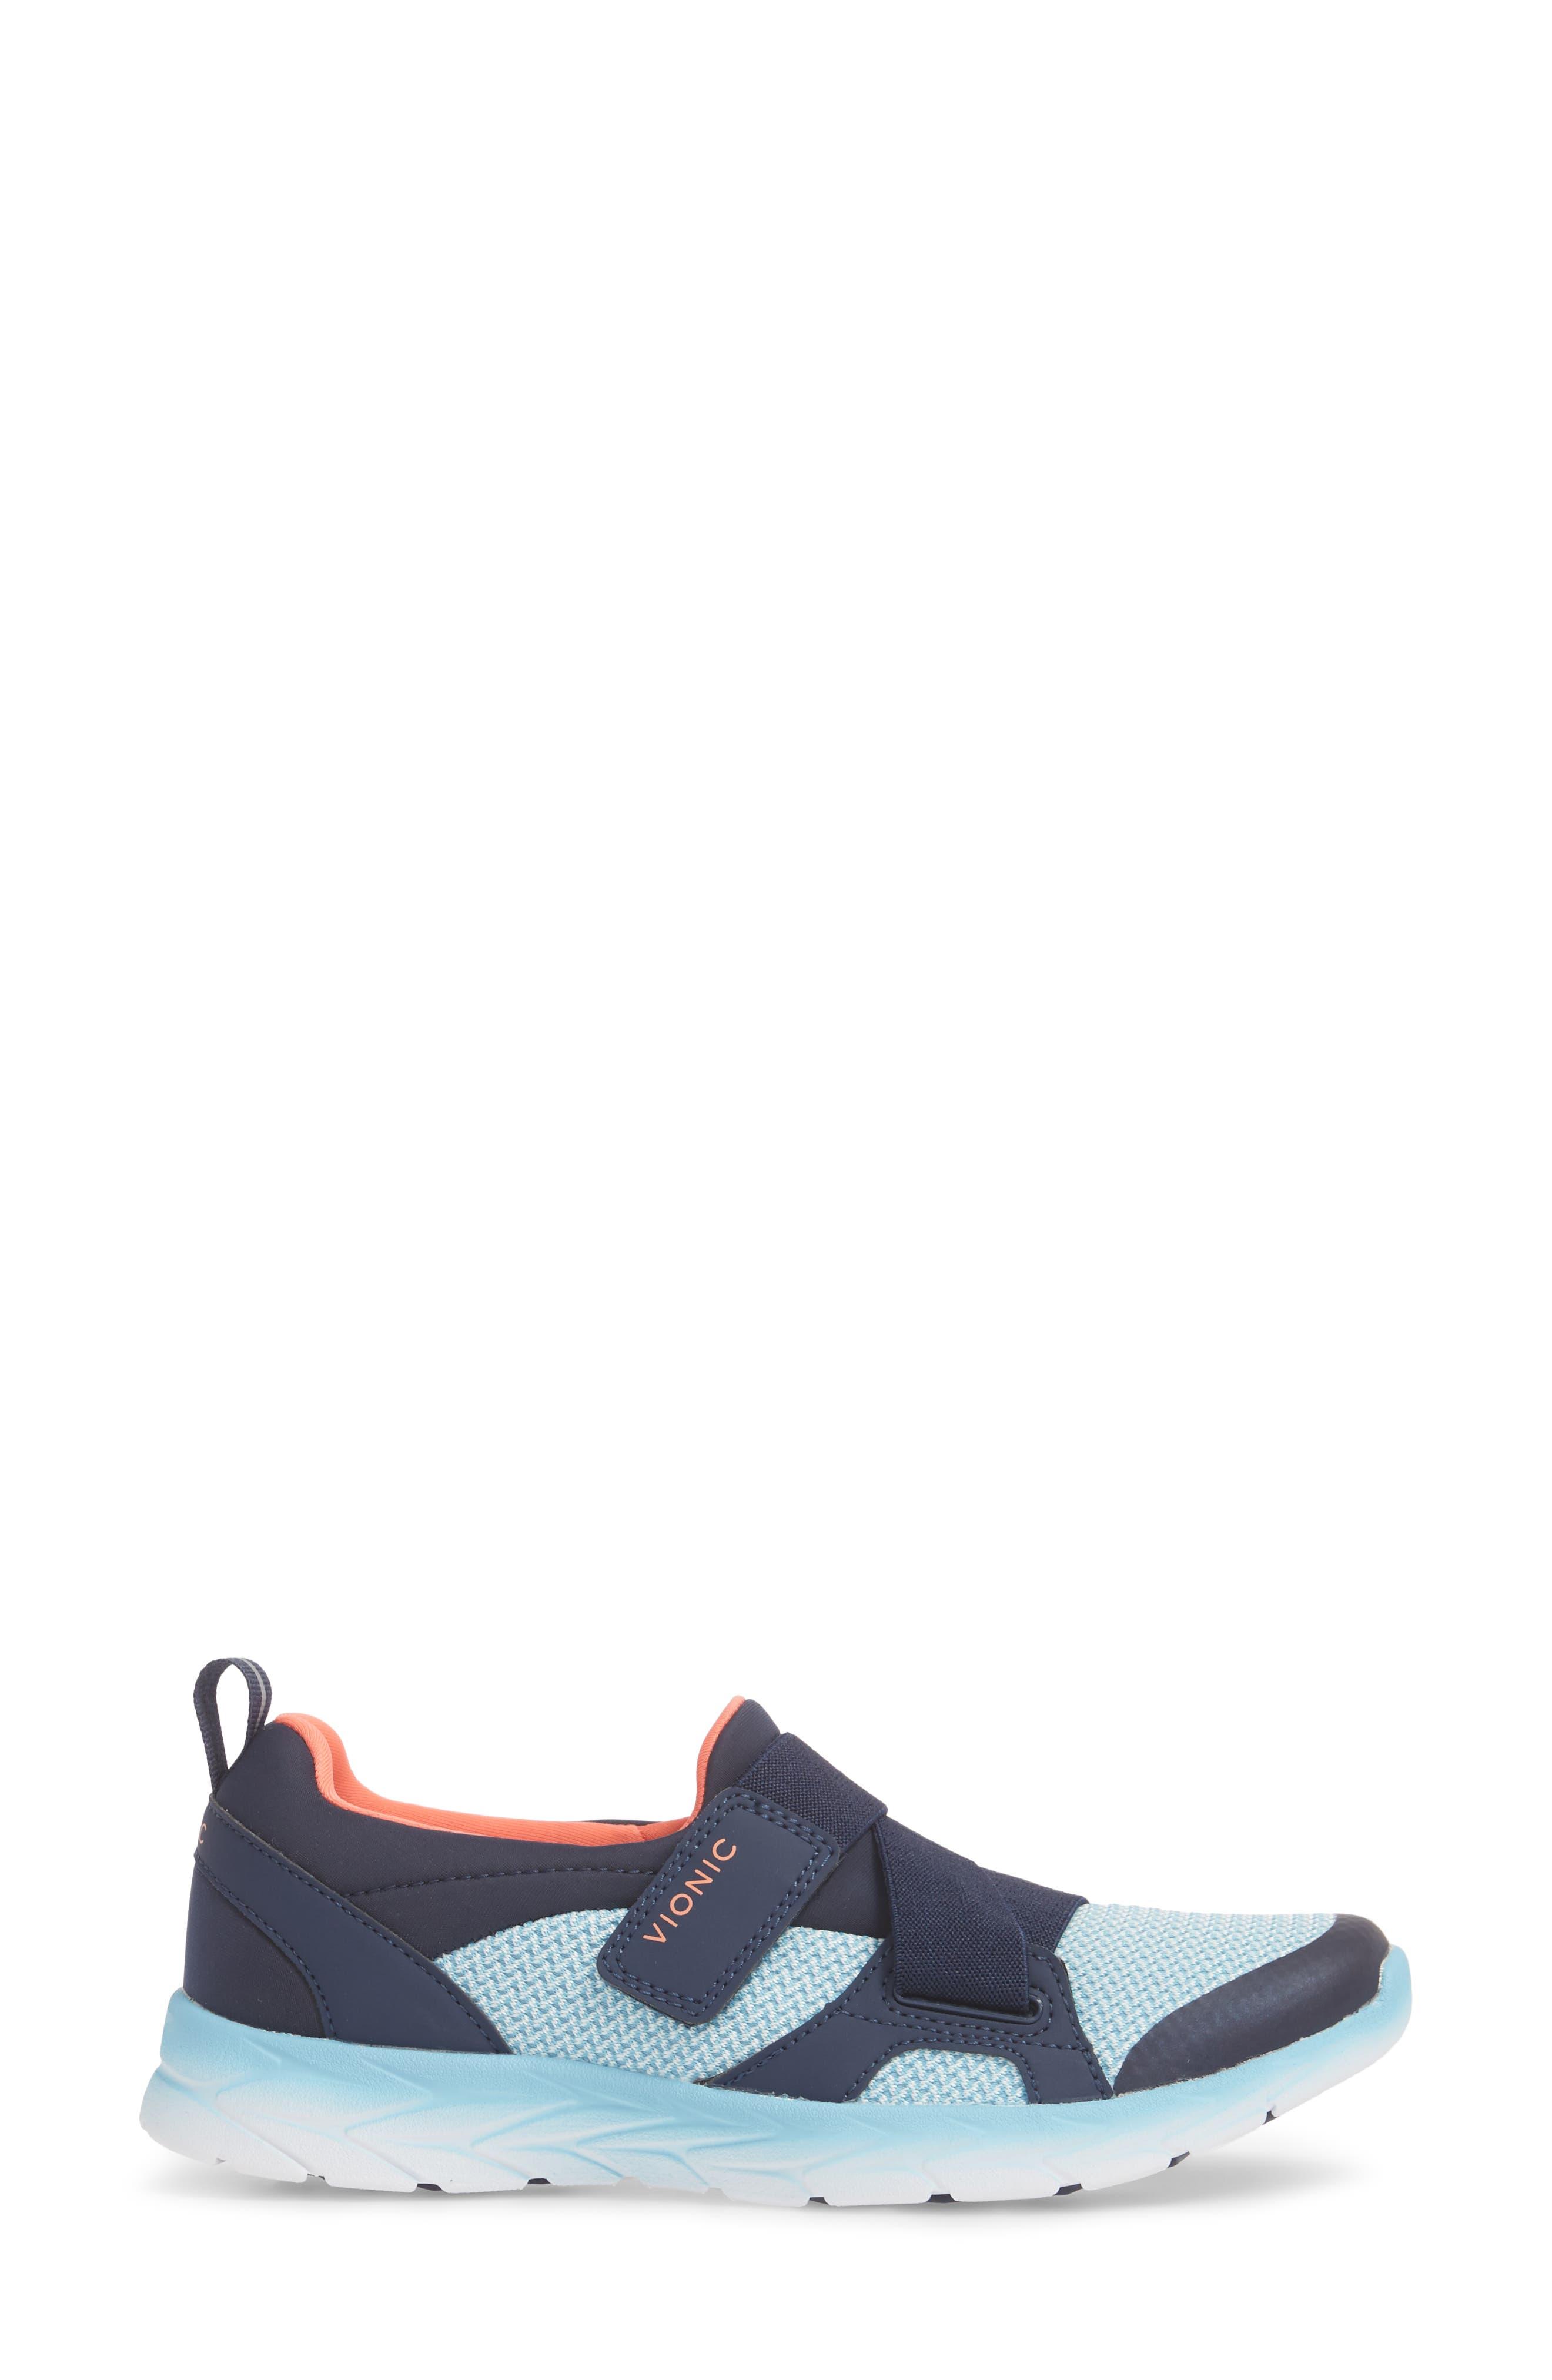 Dash Sneaker,                             Alternate thumbnail 3, color,                             Navy/ Light Blue Fabric